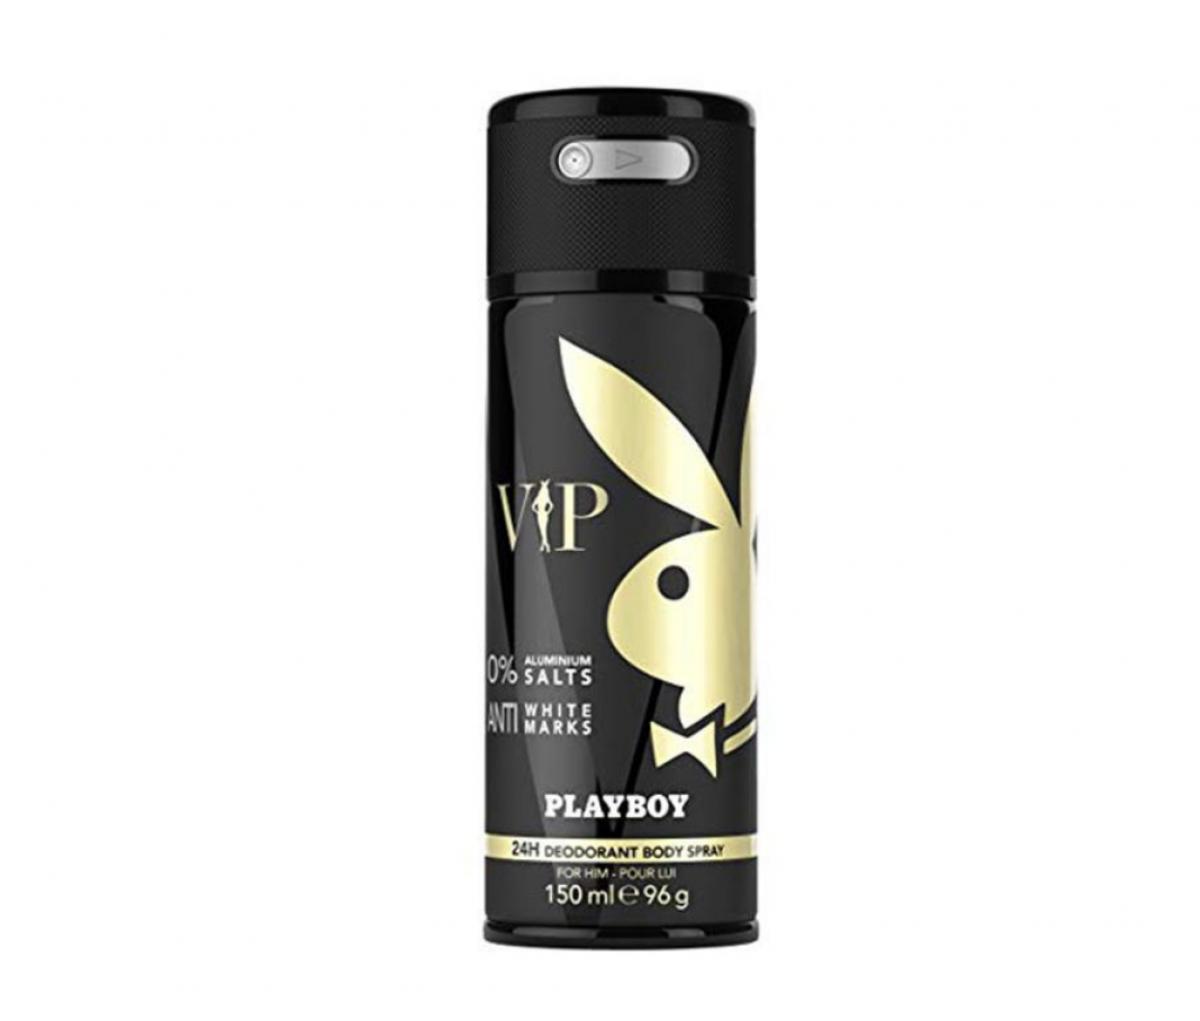 Playboy Deo 150ml VIP